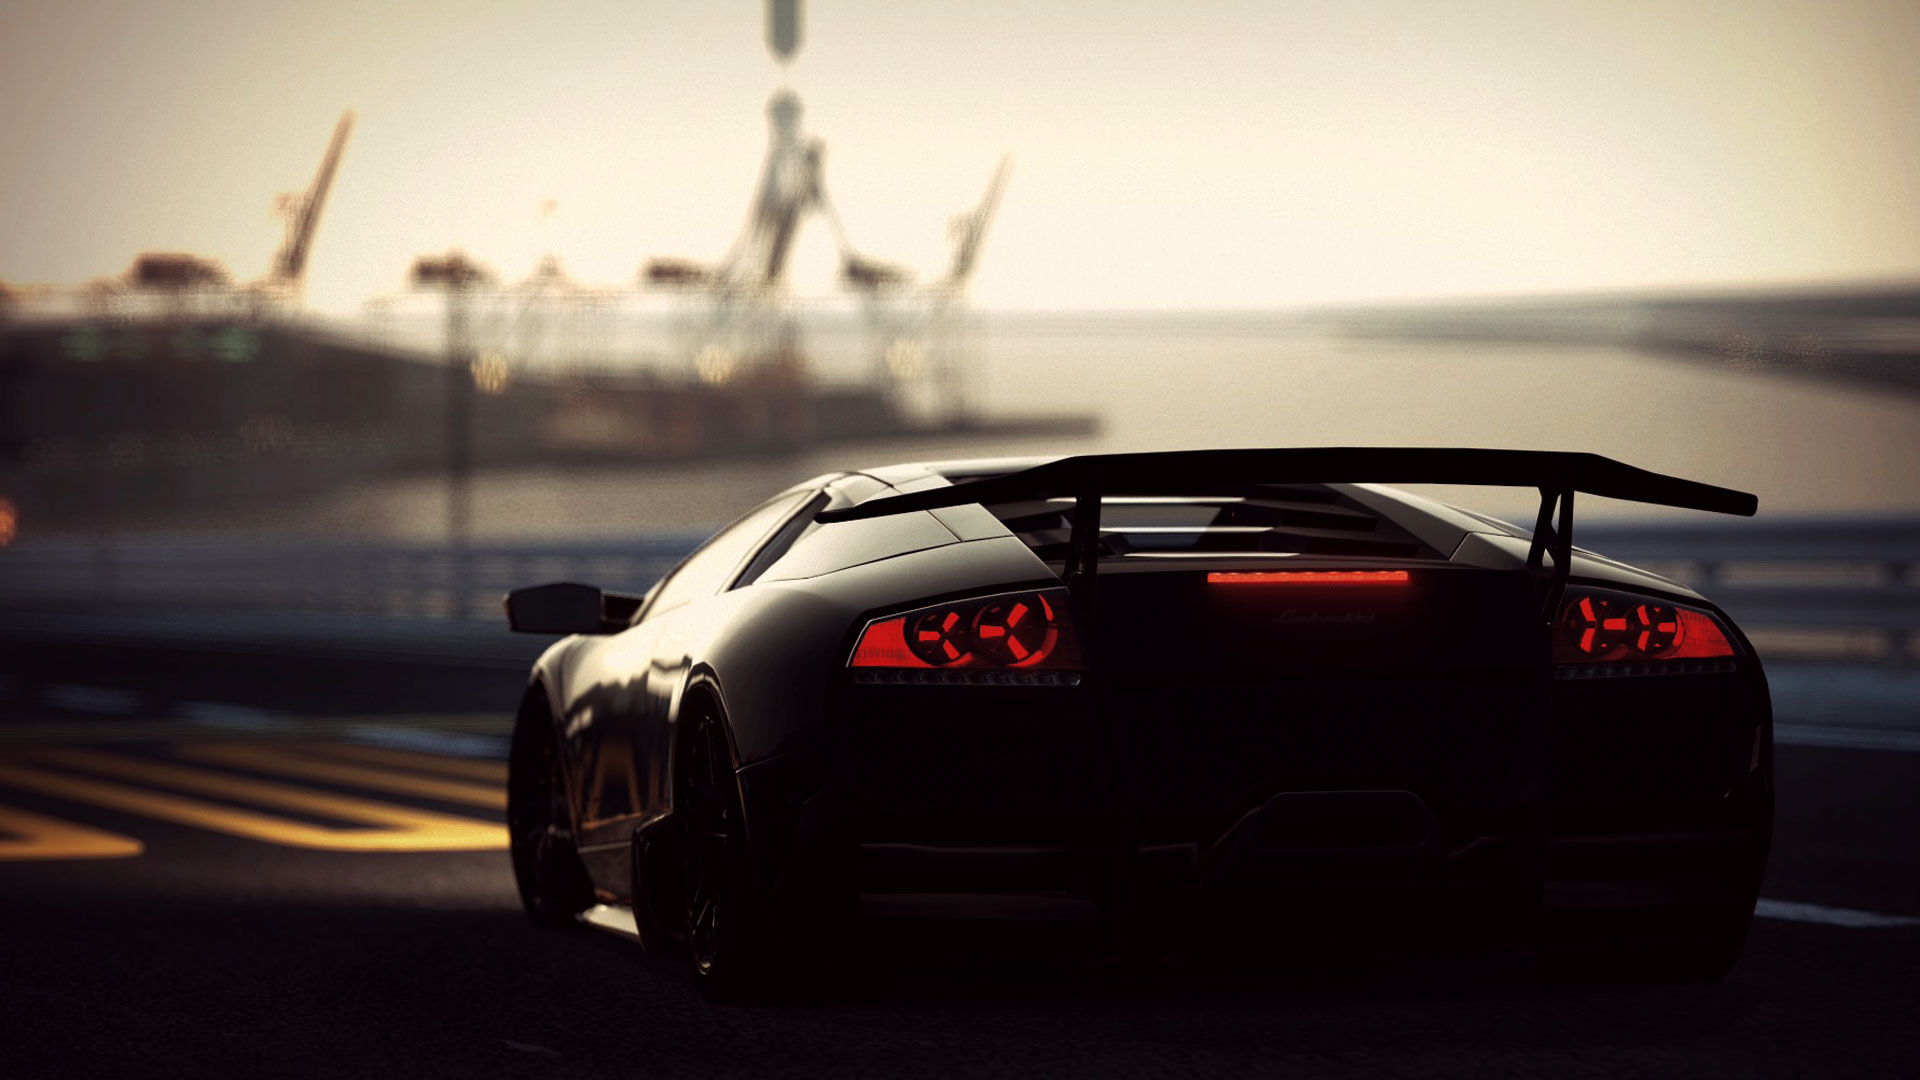 Lamborghini 2019 100 Quality Hd